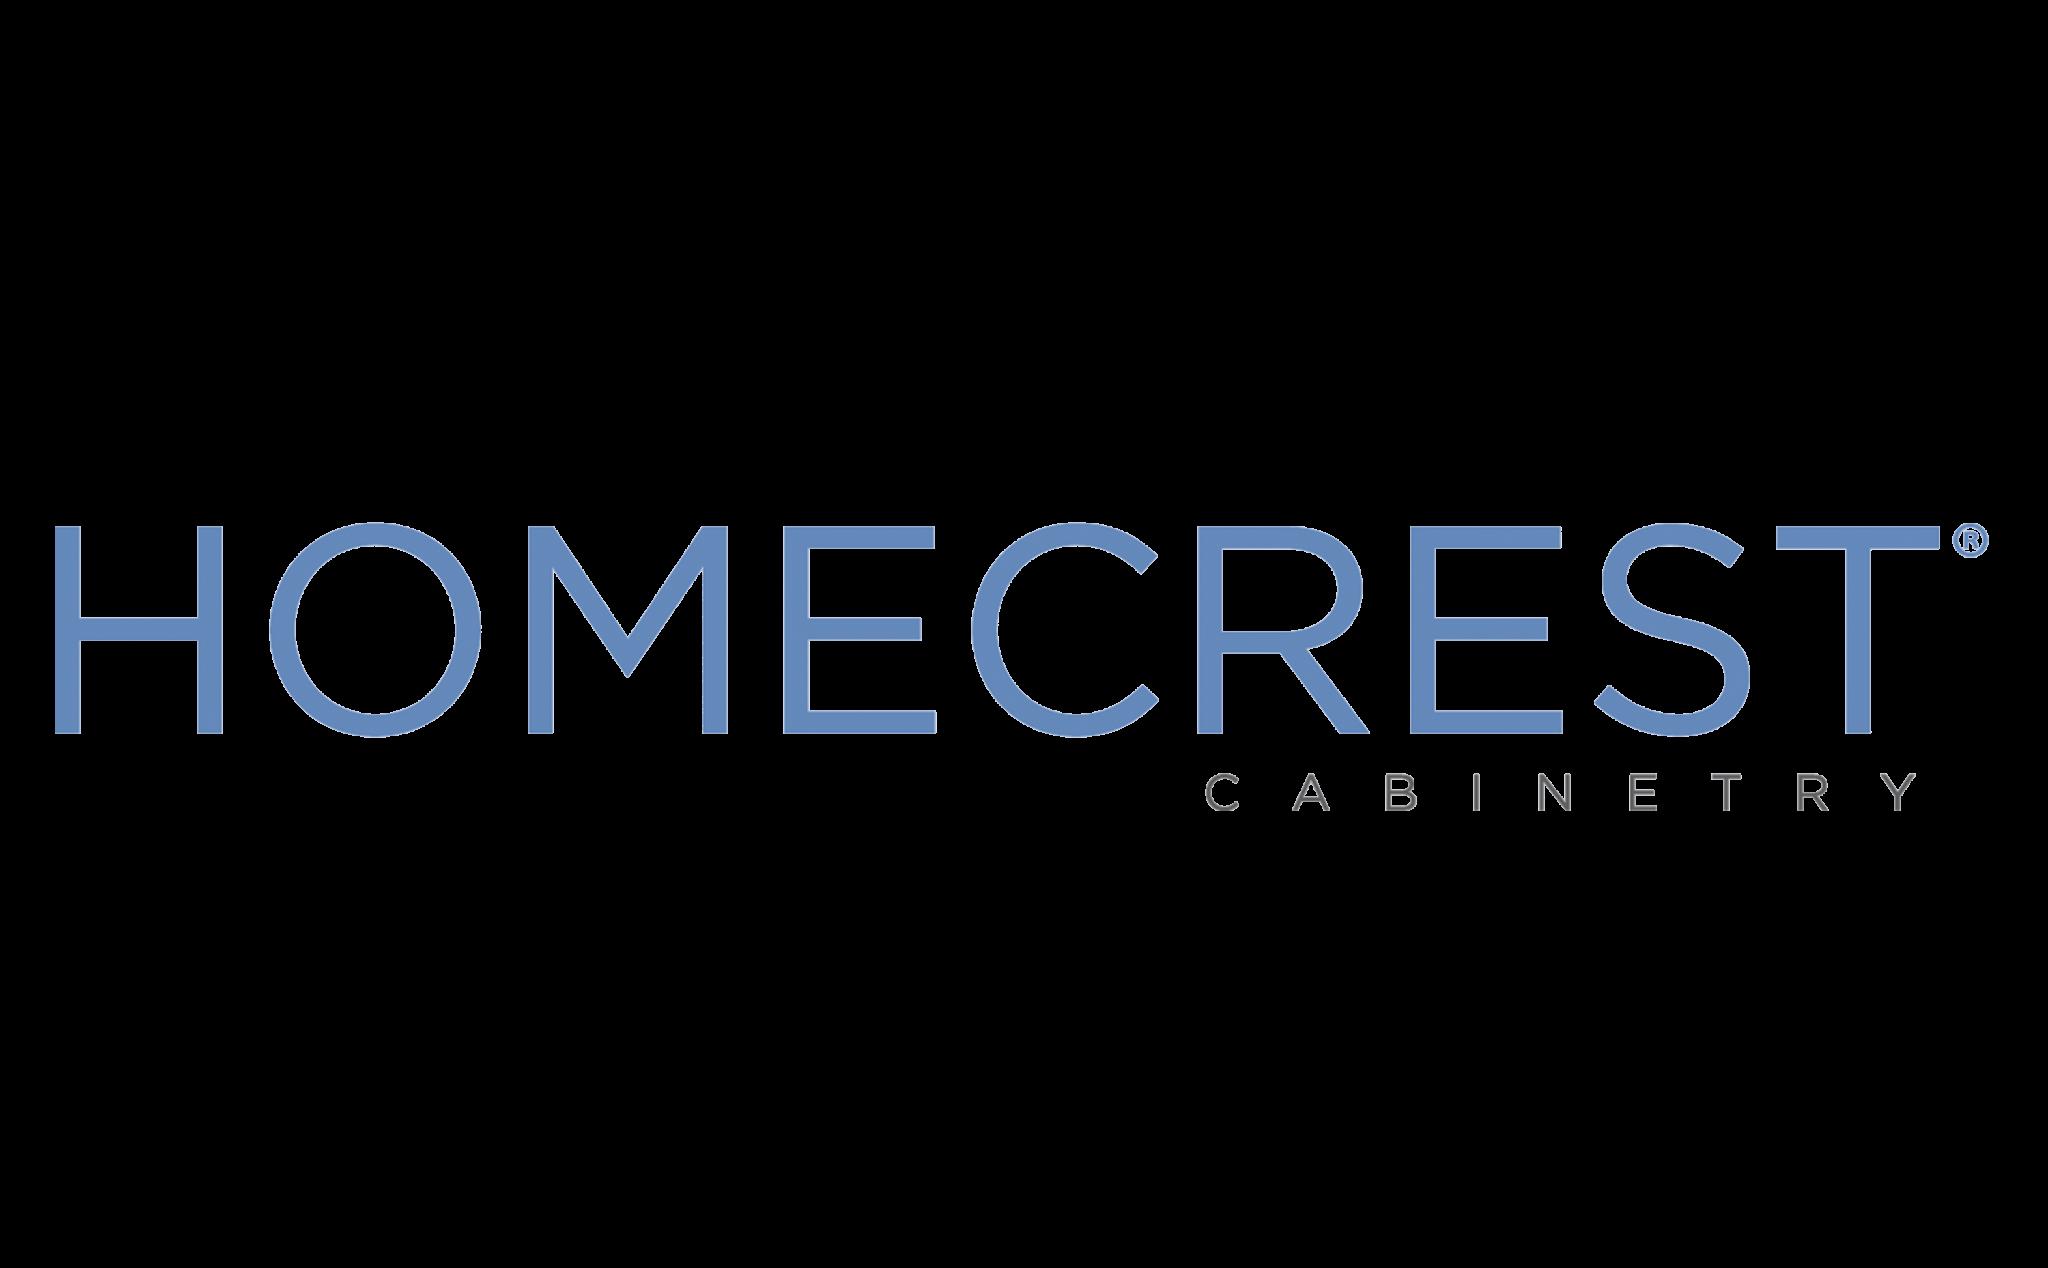 homecrest cabinetry logo